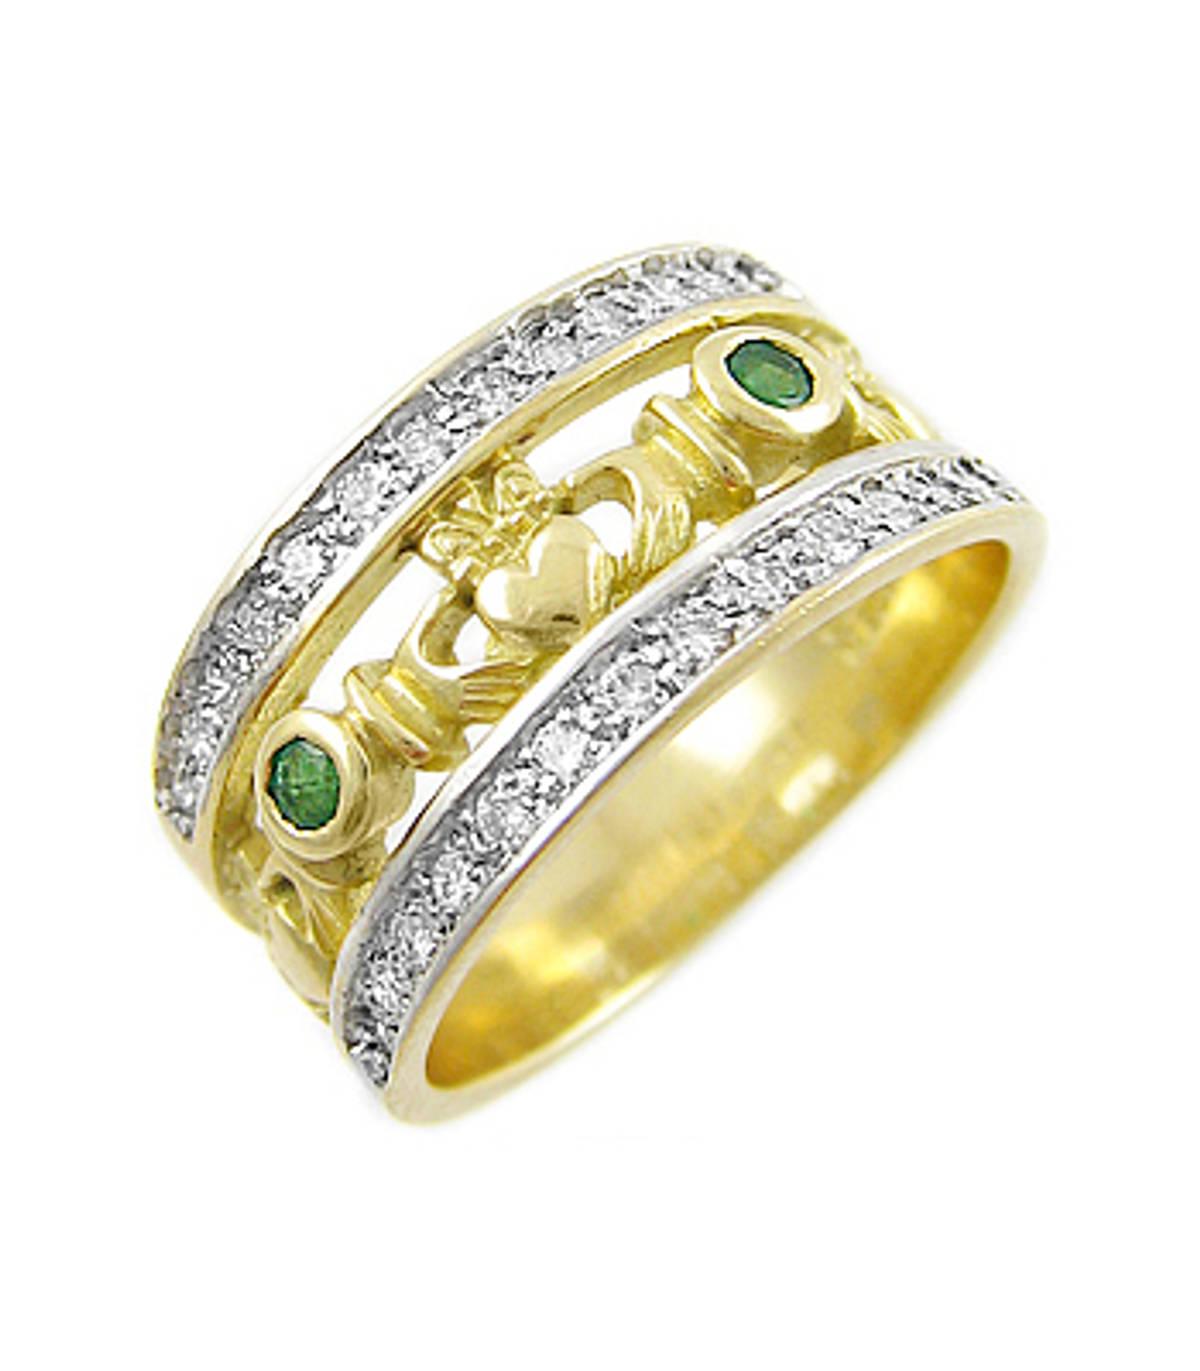 Irish made 14 carat yellow gold emerald 0.10cts/diamonds 0.26cts claddagh engagement ring